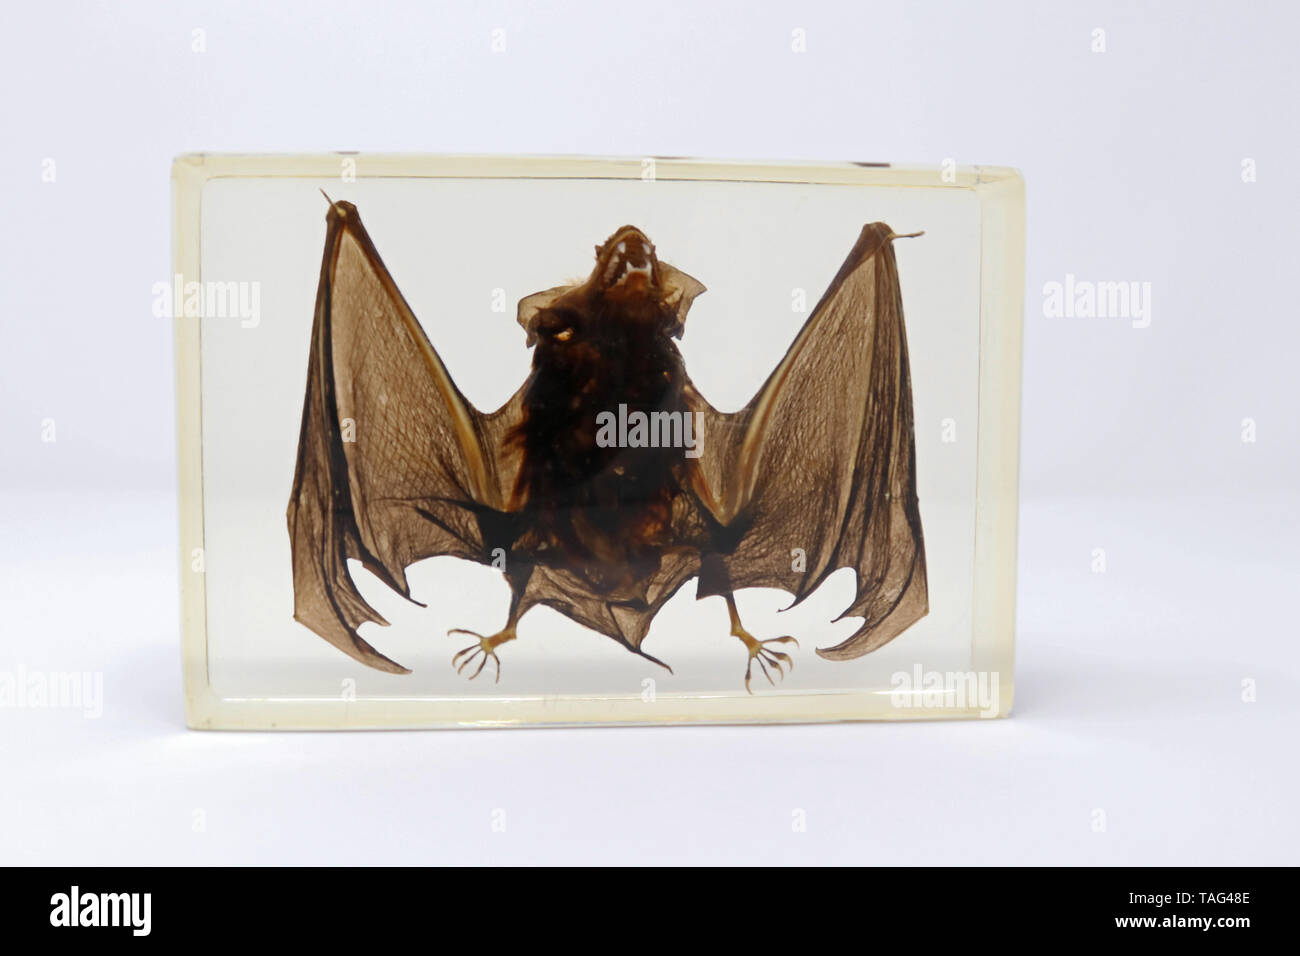 Preserved Bat Specimen in Lucite Resin - Stock Image